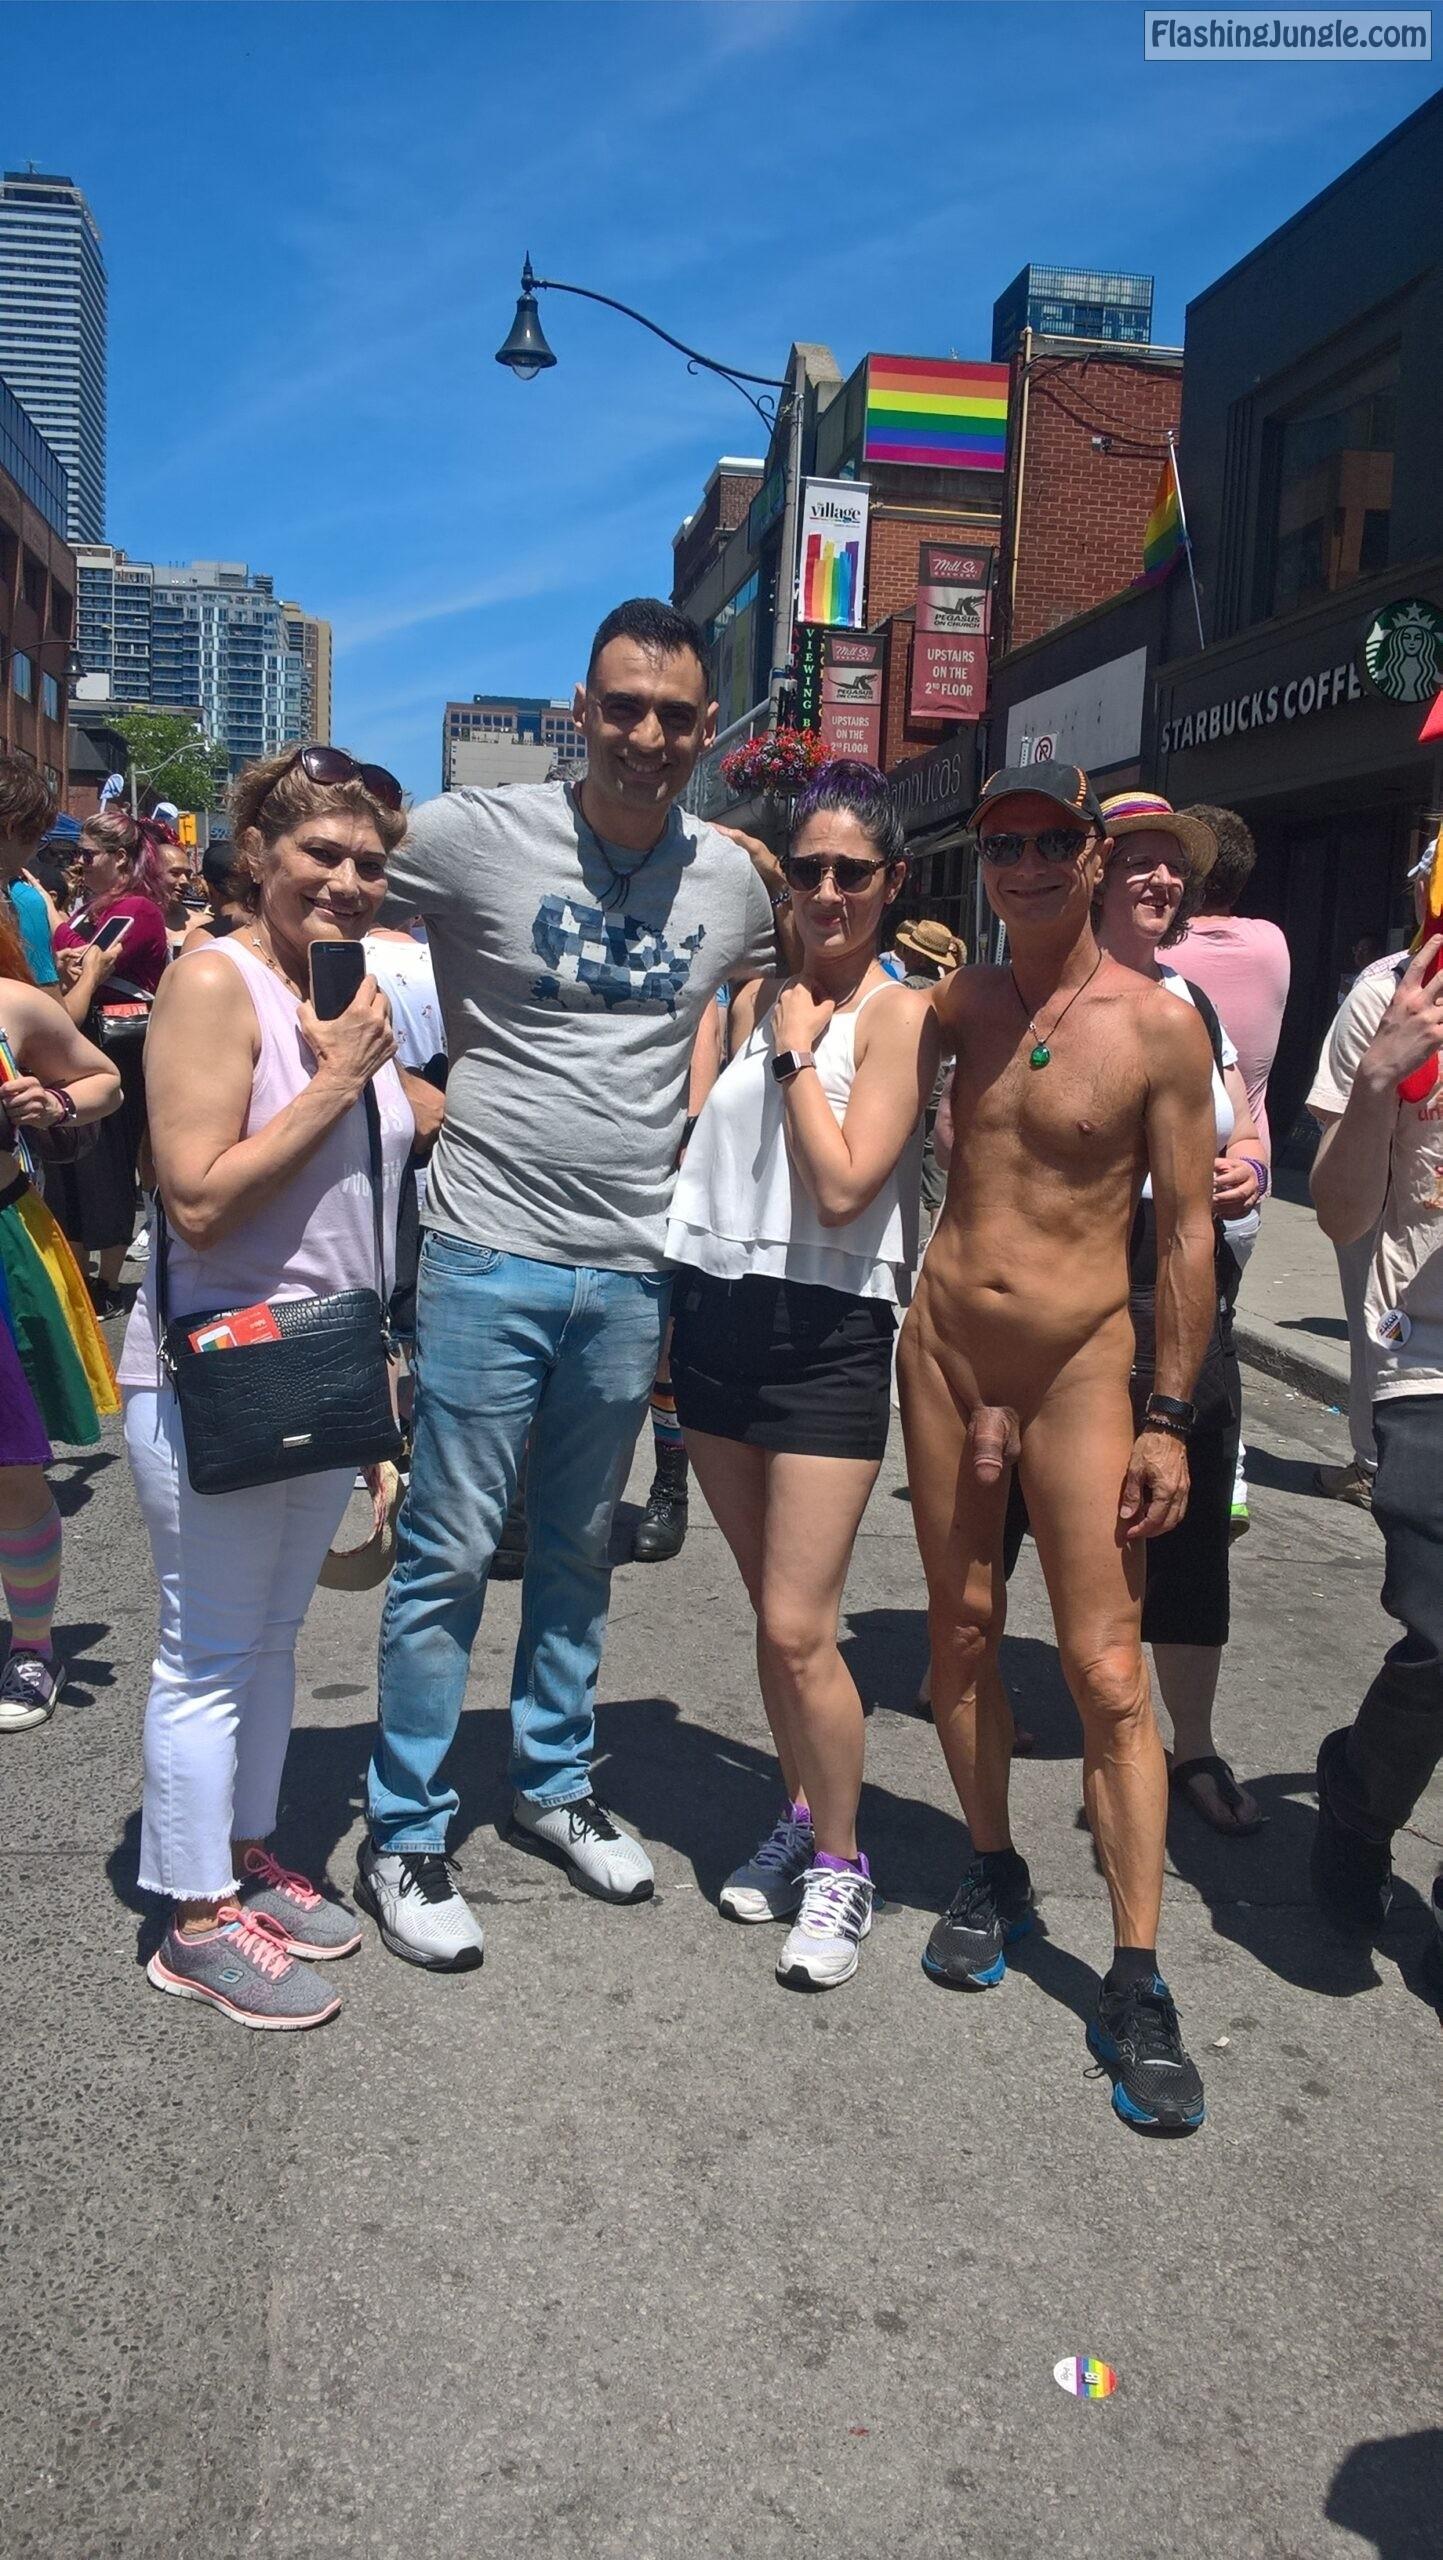 Real Amateurs Public Nudity Pics